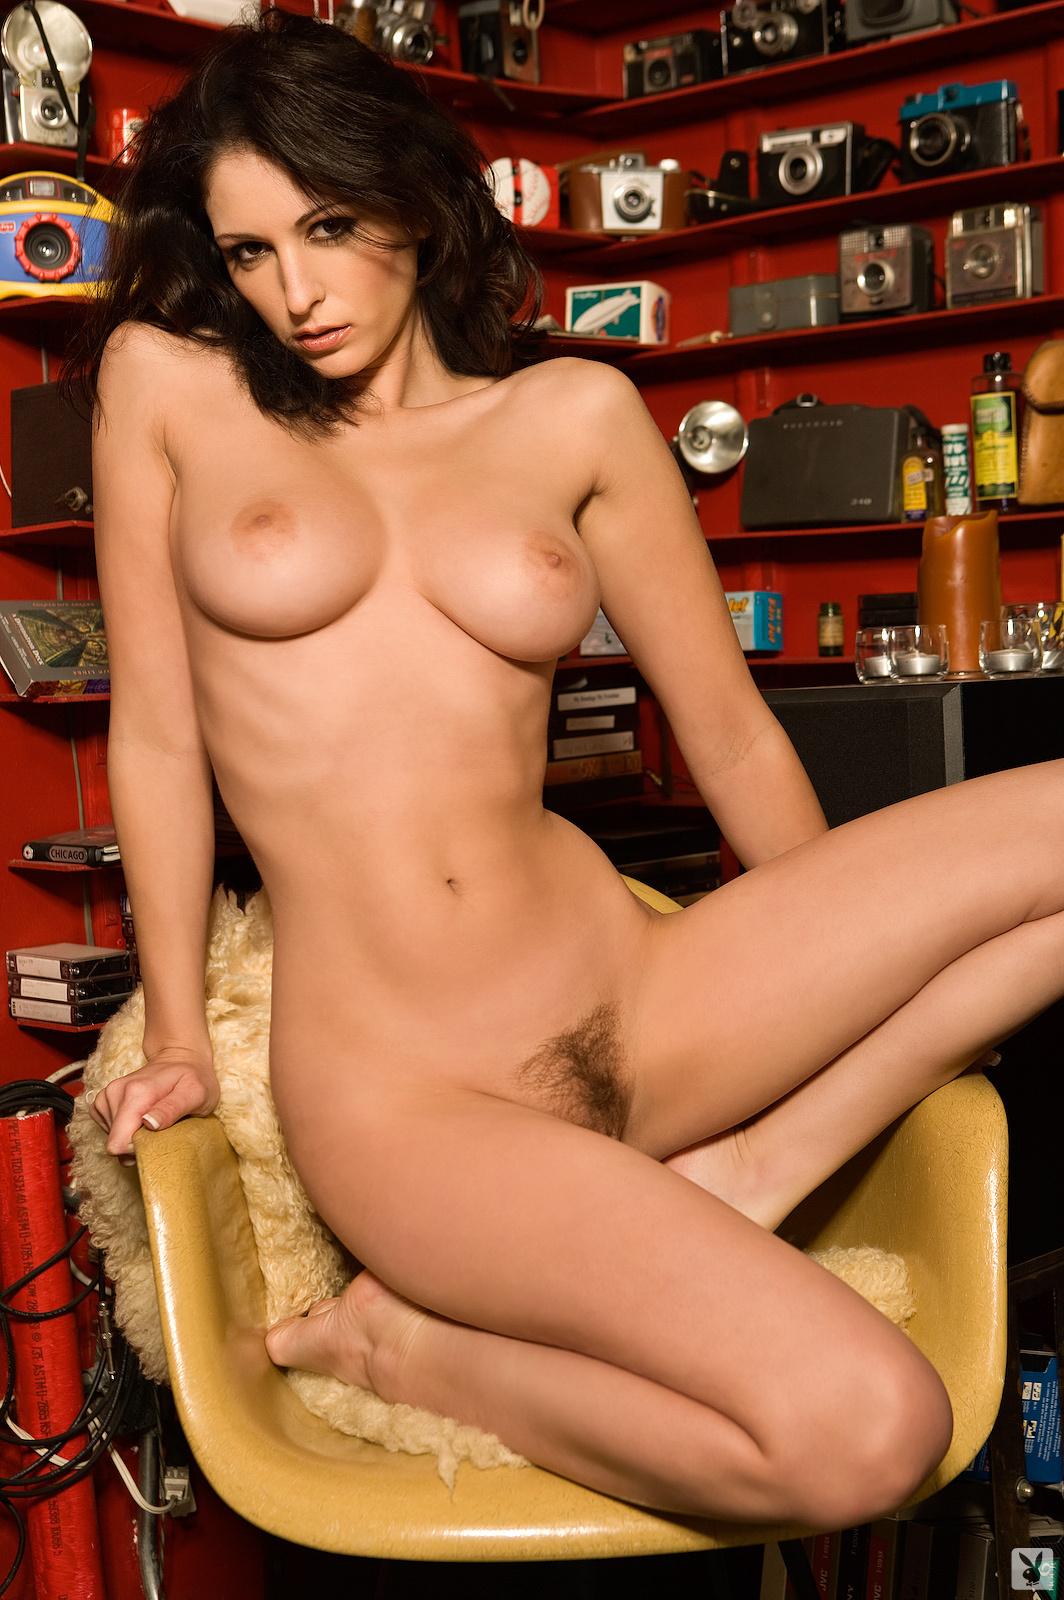 Cyber Girl Xtra December 2008 Carlotta Champagne 03 Playboy Plus (29)